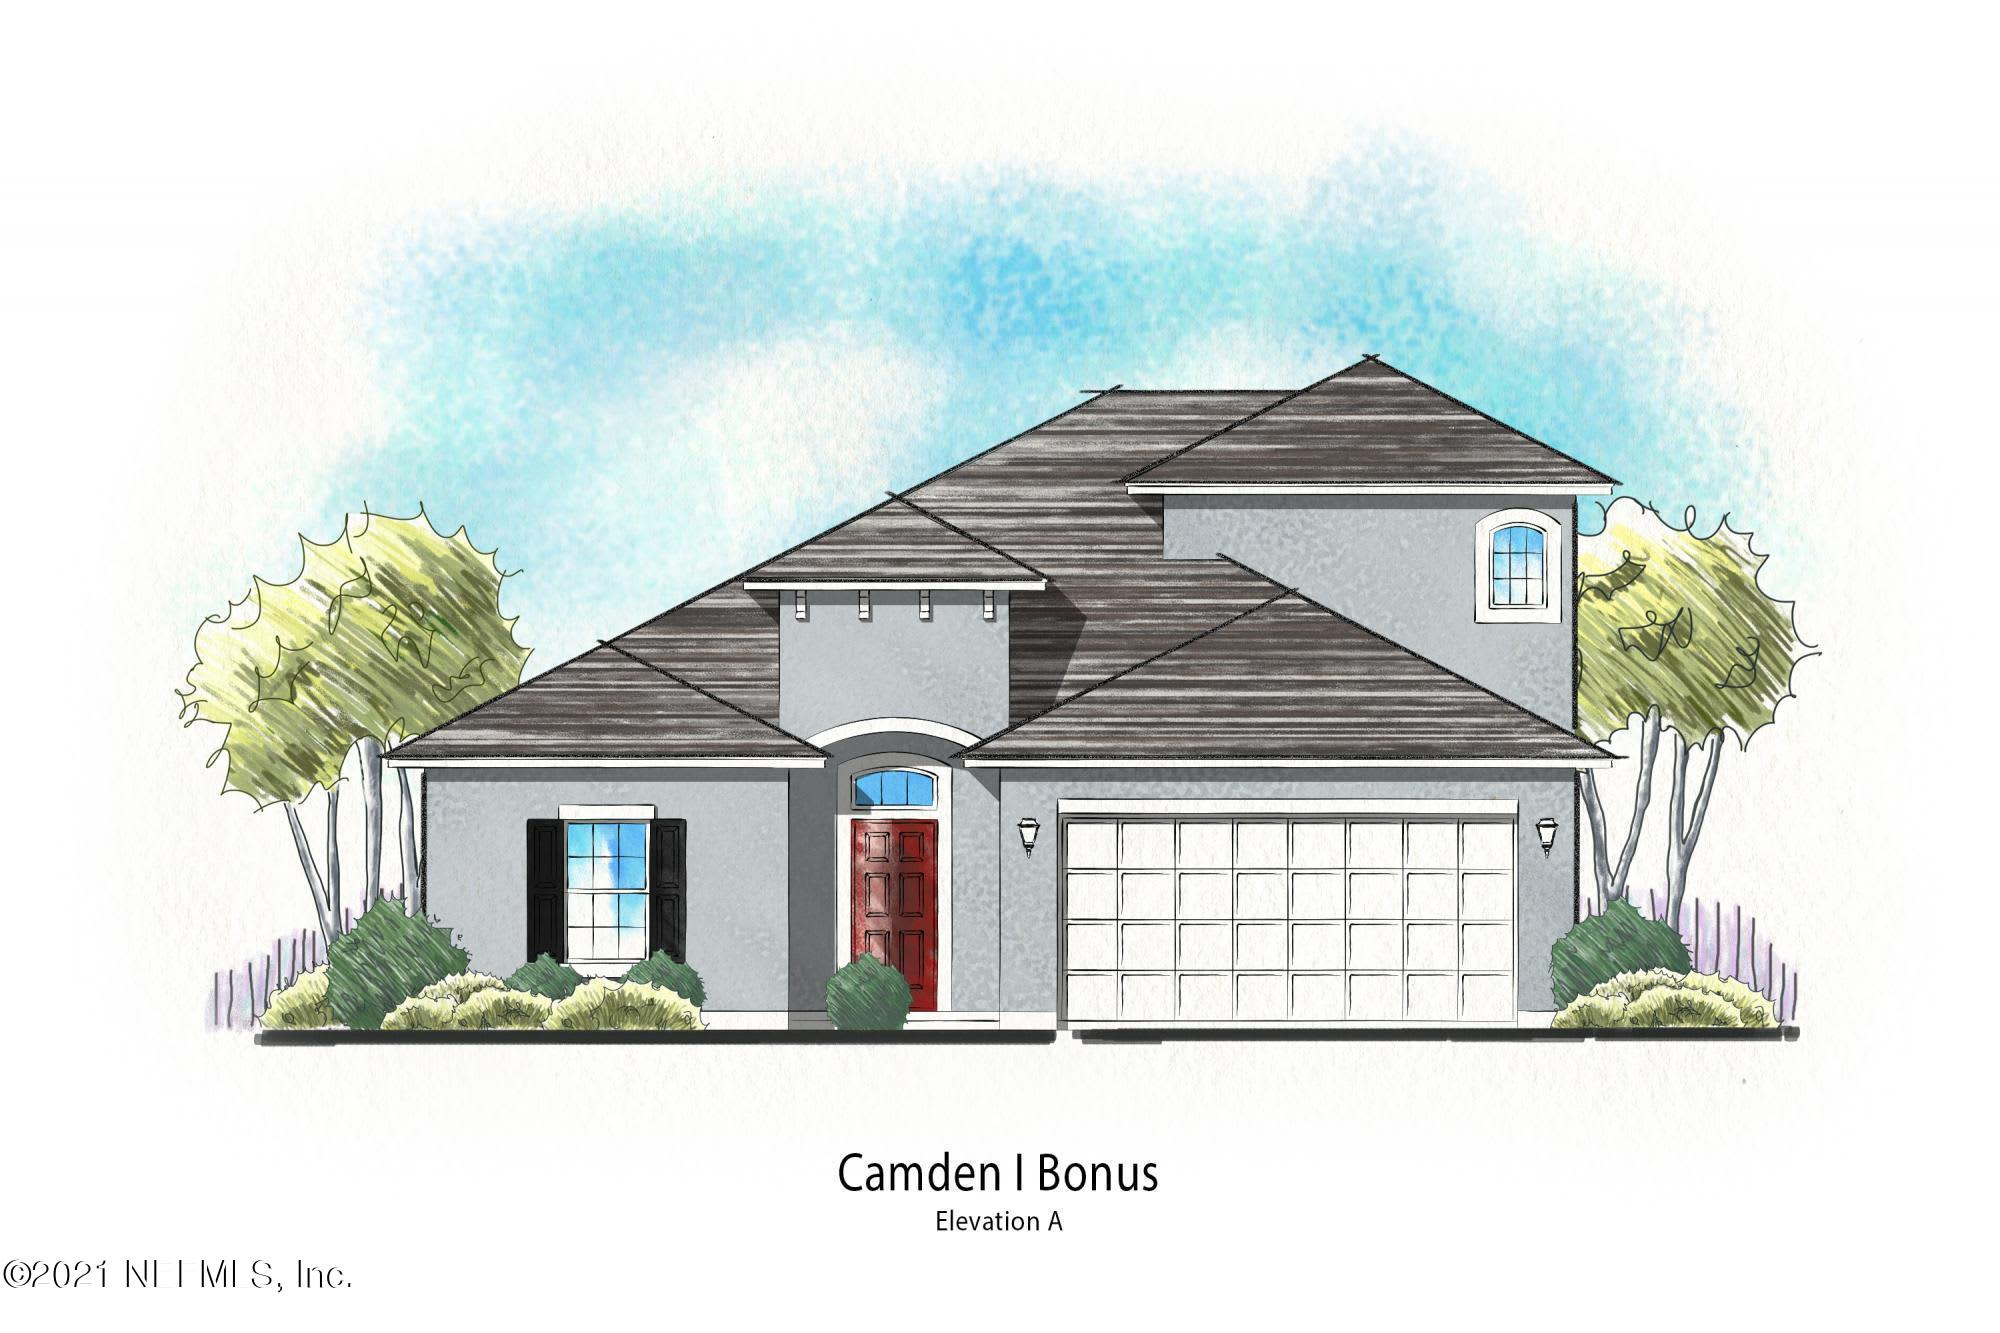 2874 COPPERWOOD, ORANGE PARK, FLORIDA 32073, 4 Bedrooms Bedrooms, ,3 BathroomsBathrooms,Residential,For sale,COPPERWOOD,1097214